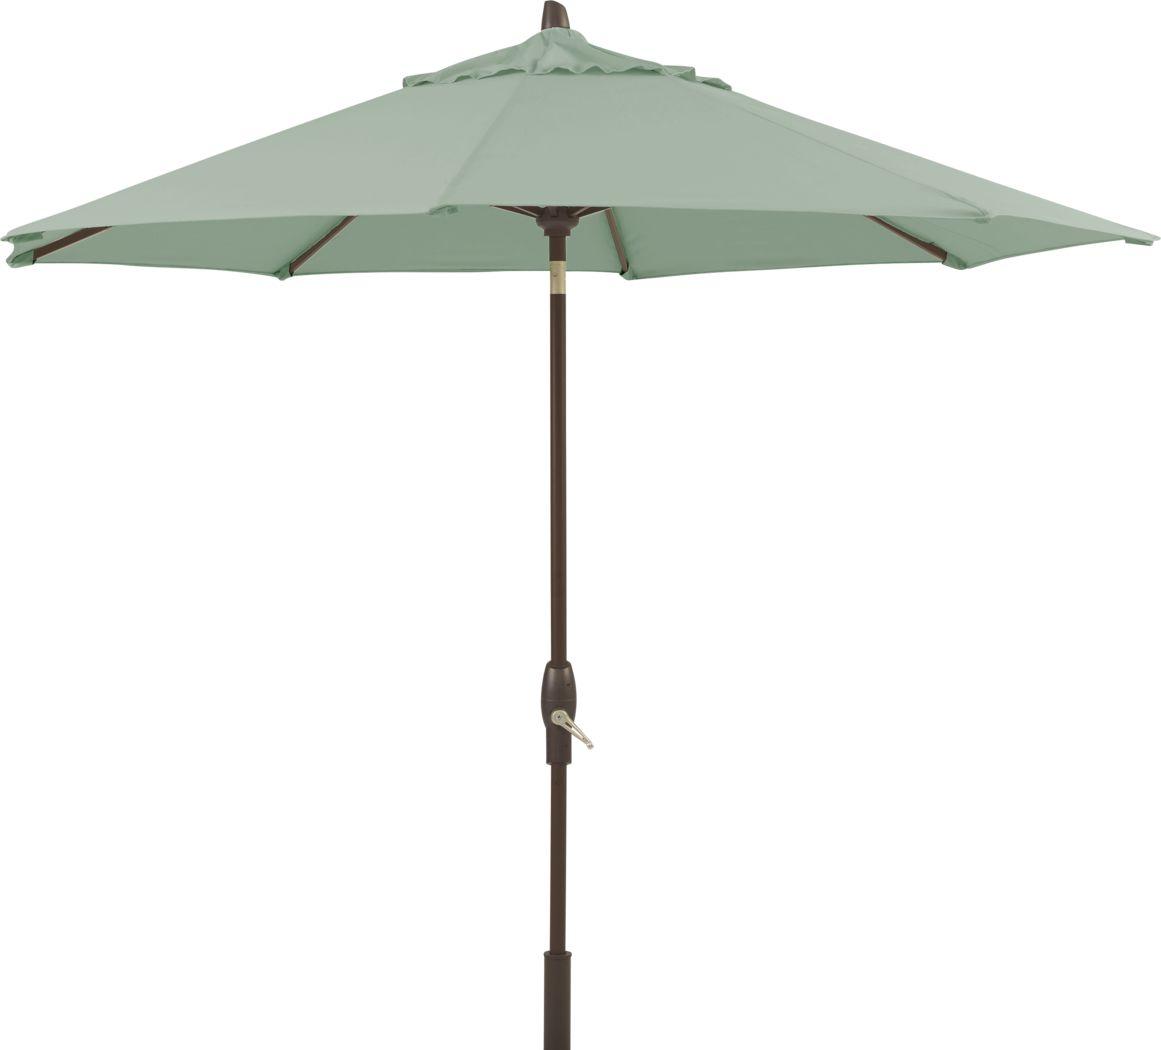 "Seaport 9"" Octagon Seafoam Outdoor Umbrella"